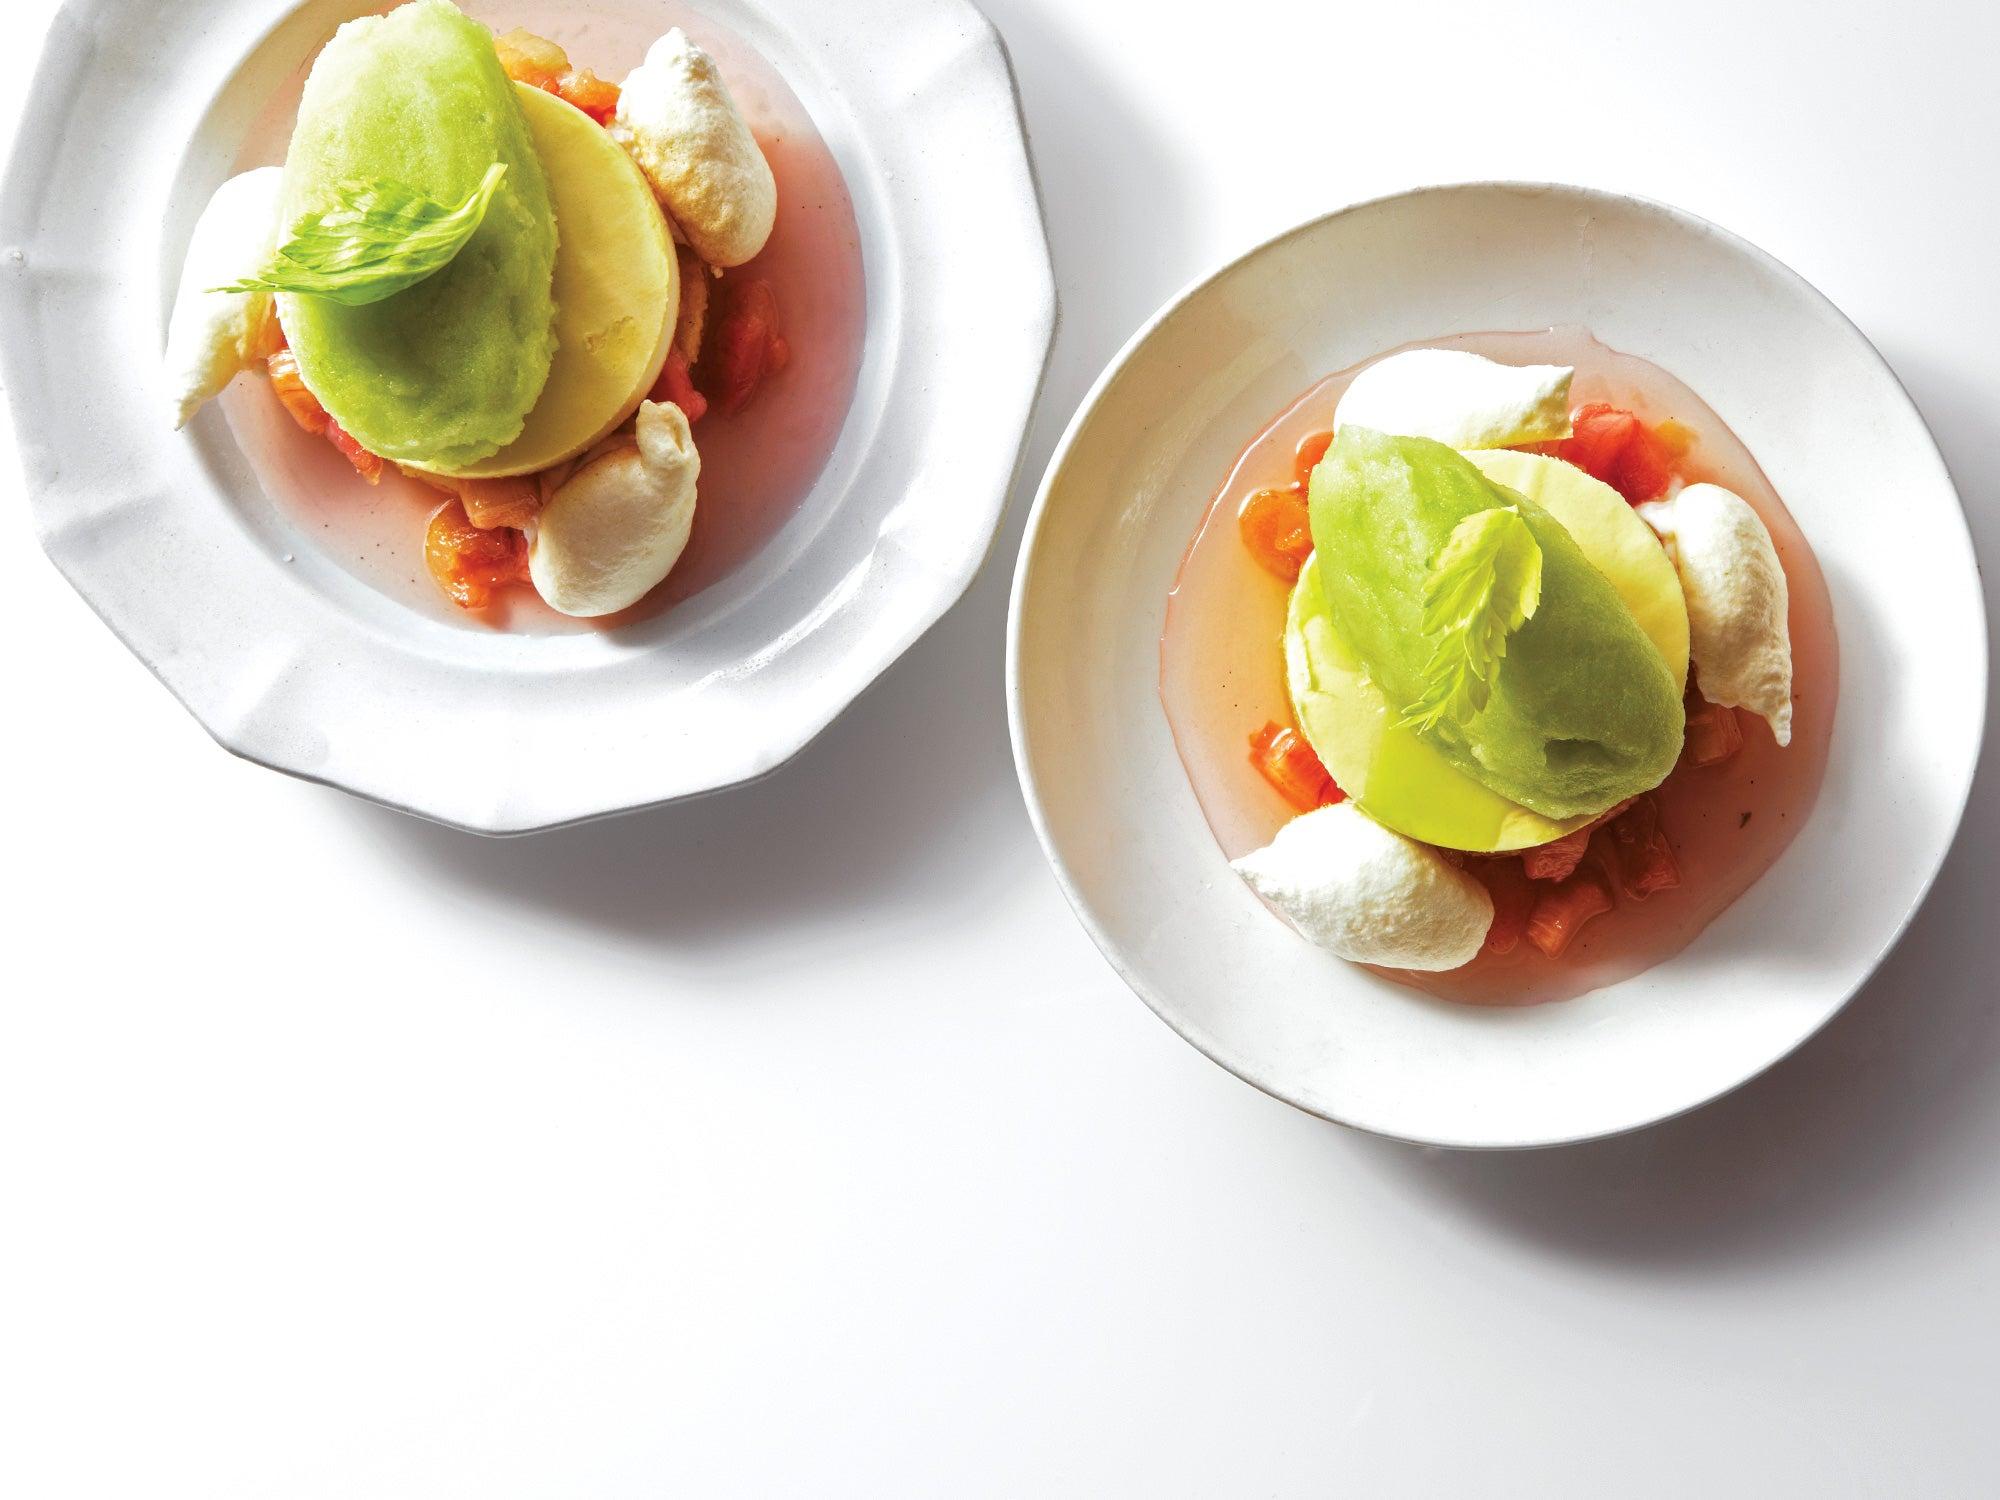 Celery and Rhubarb Vacherin